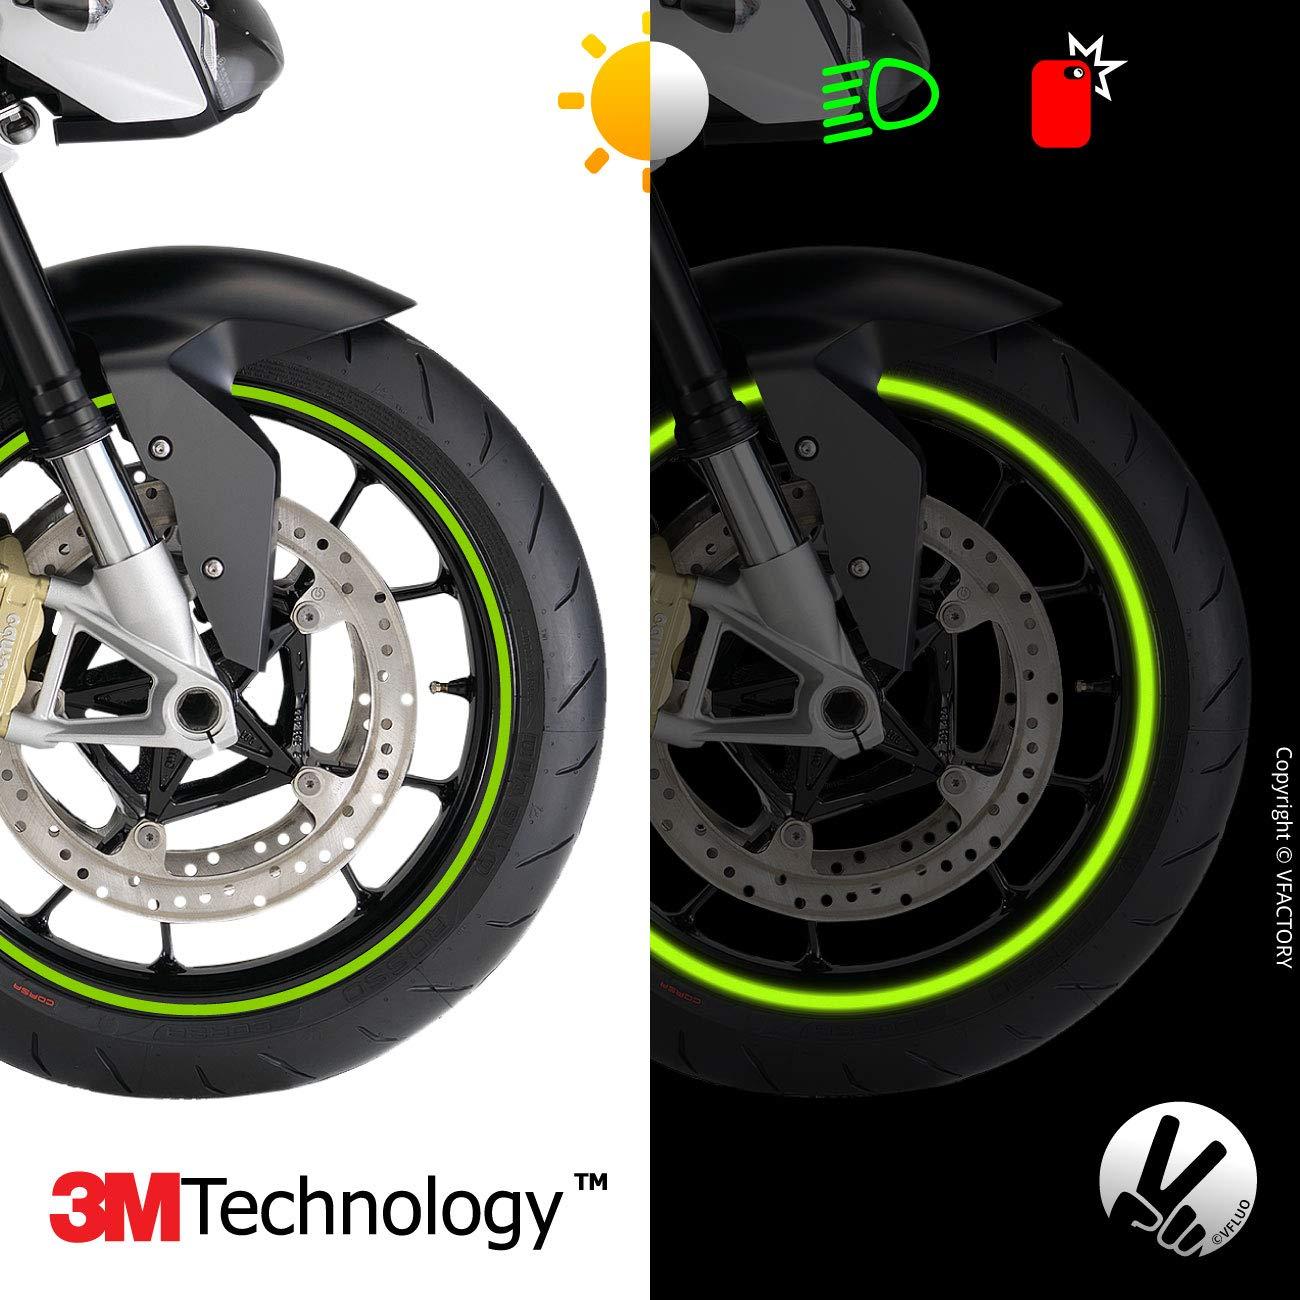 VFLUO CircularTM, Kit de Cintas, Rayas Retro Reflectantes para Llantas de Moto (1 Rueda), 3M TechnologyTM, Anchura XL : 7 mm, Kawazaki Verde: Amazon.es: ...